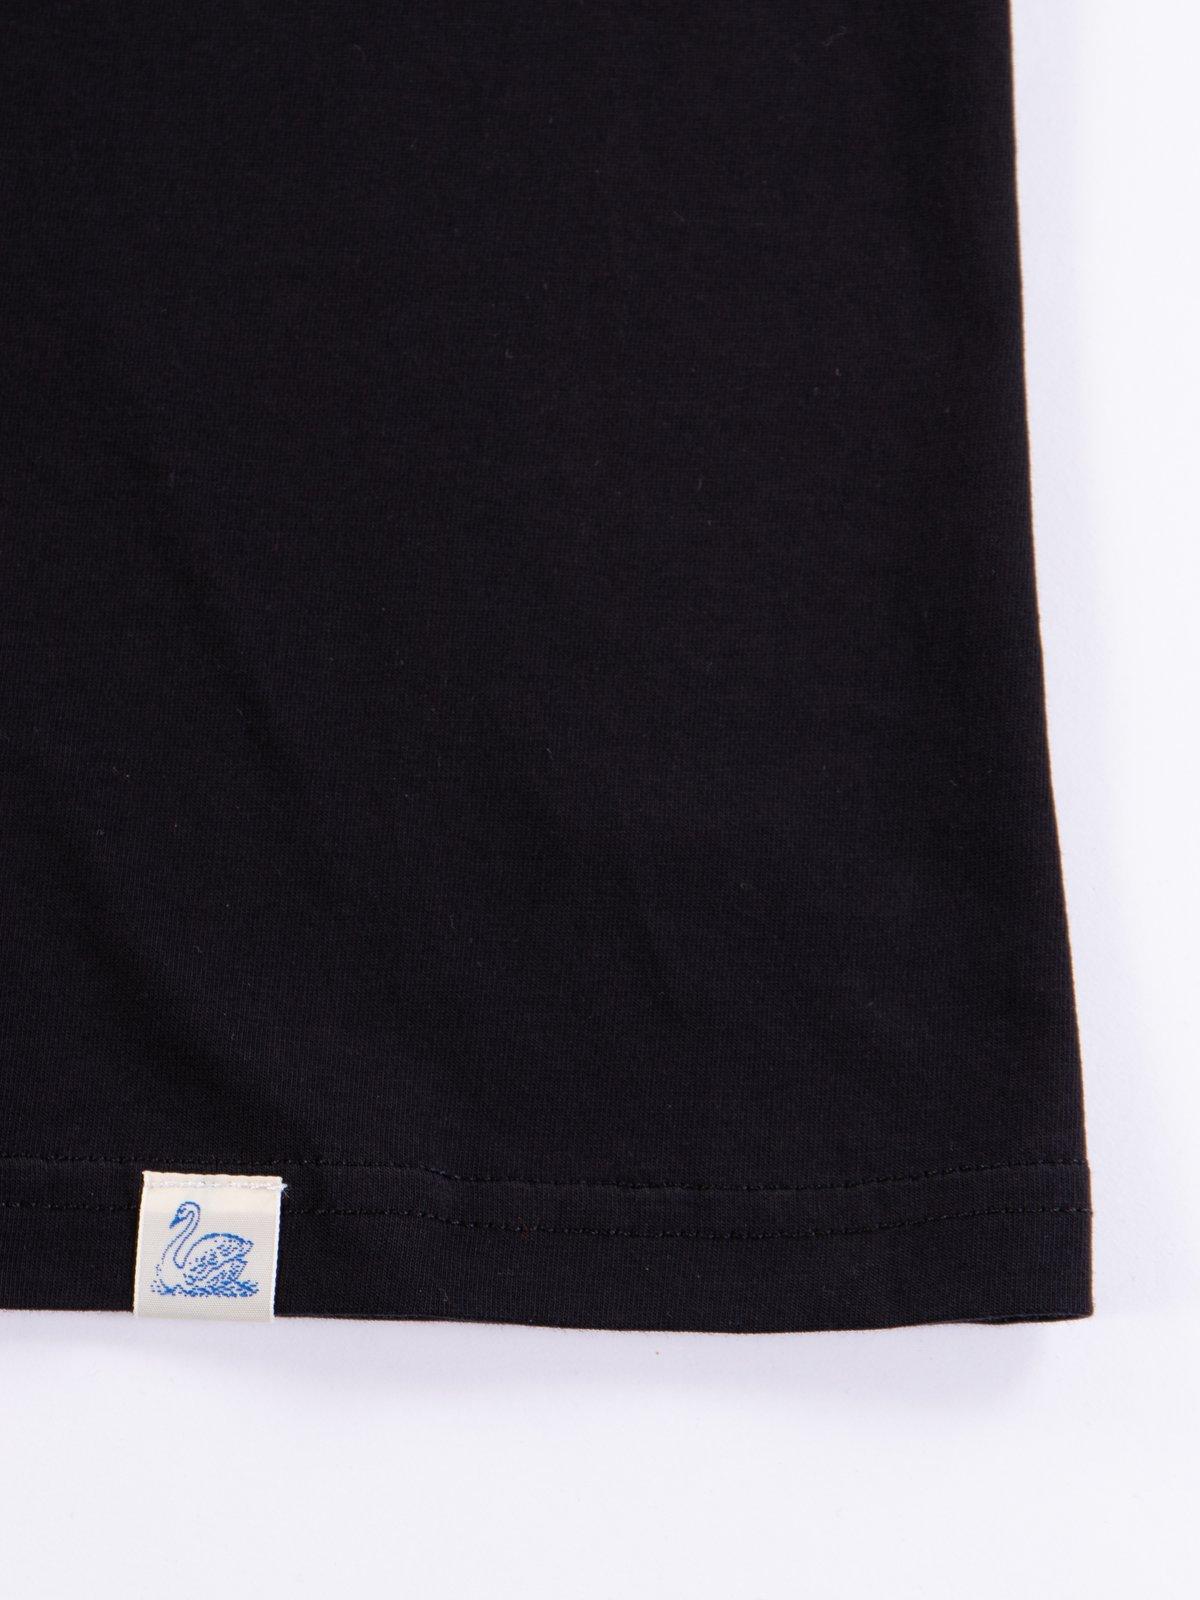 Deep Black Good Basics CTP01 Pocket Crew Neck Tee - Image 5